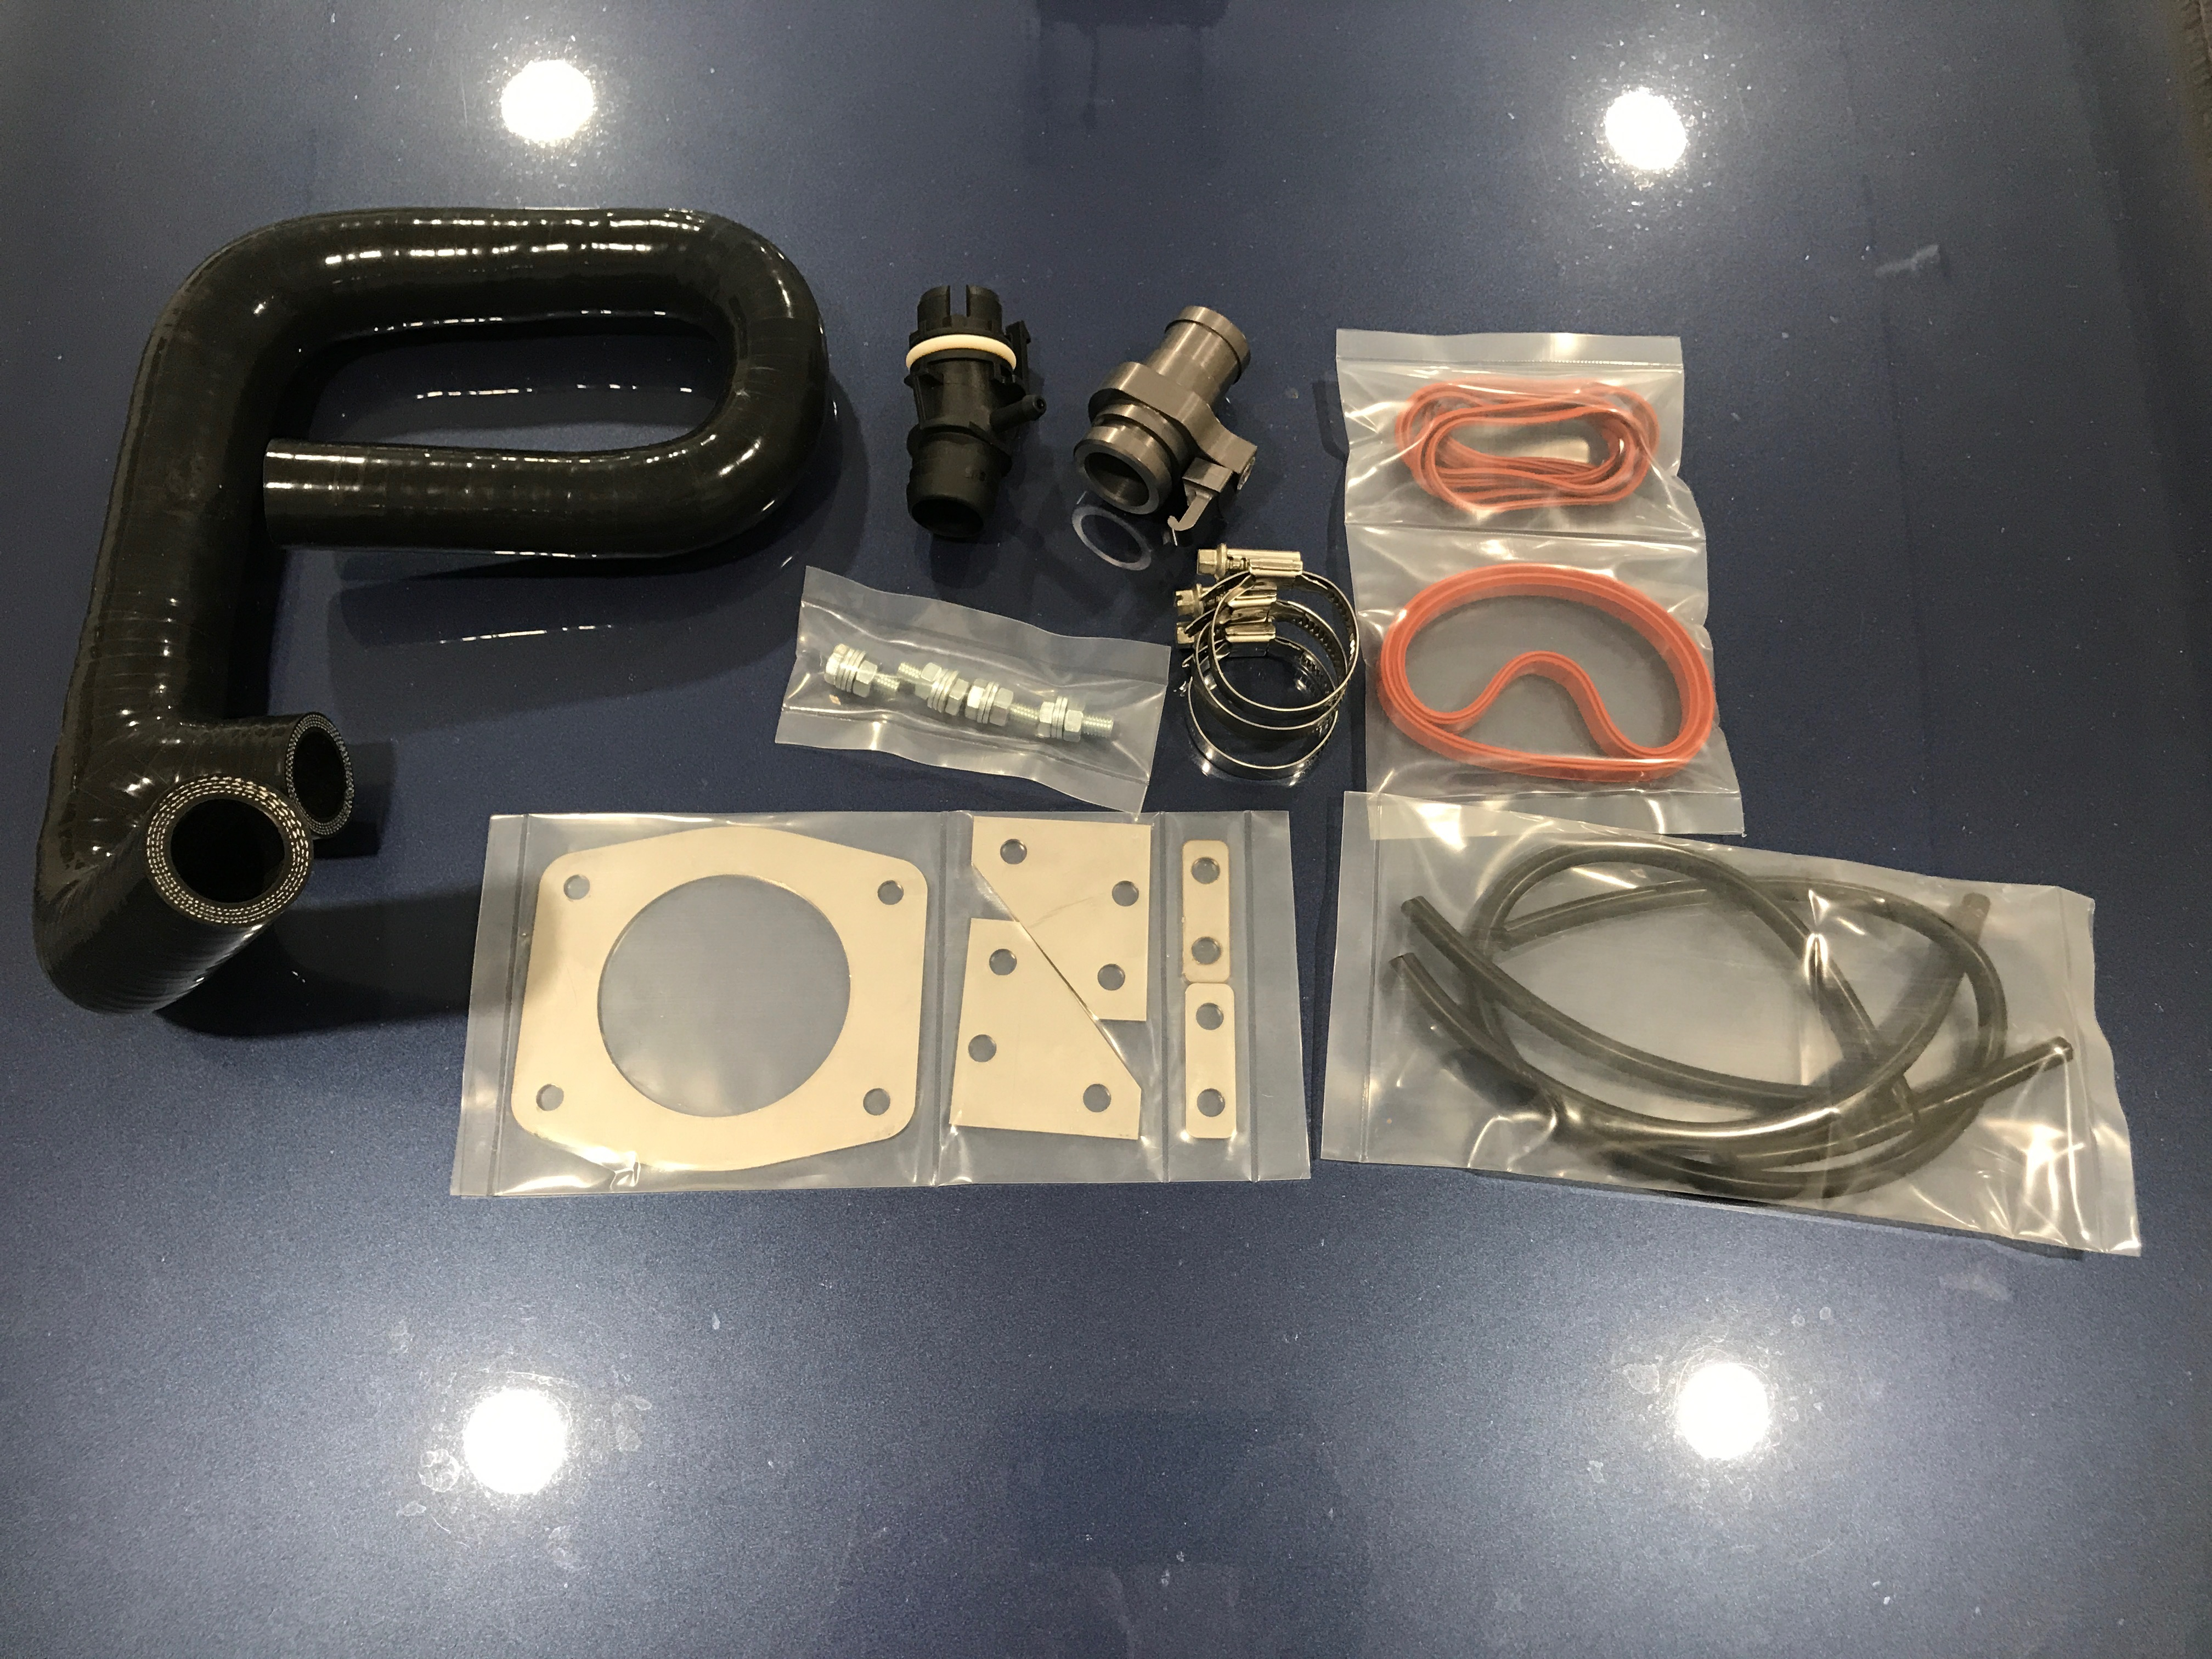 bmw e36 s52 m52 obd1 m50 manifold adapter kit kassel performance. Black Bedroom Furniture Sets. Home Design Ideas